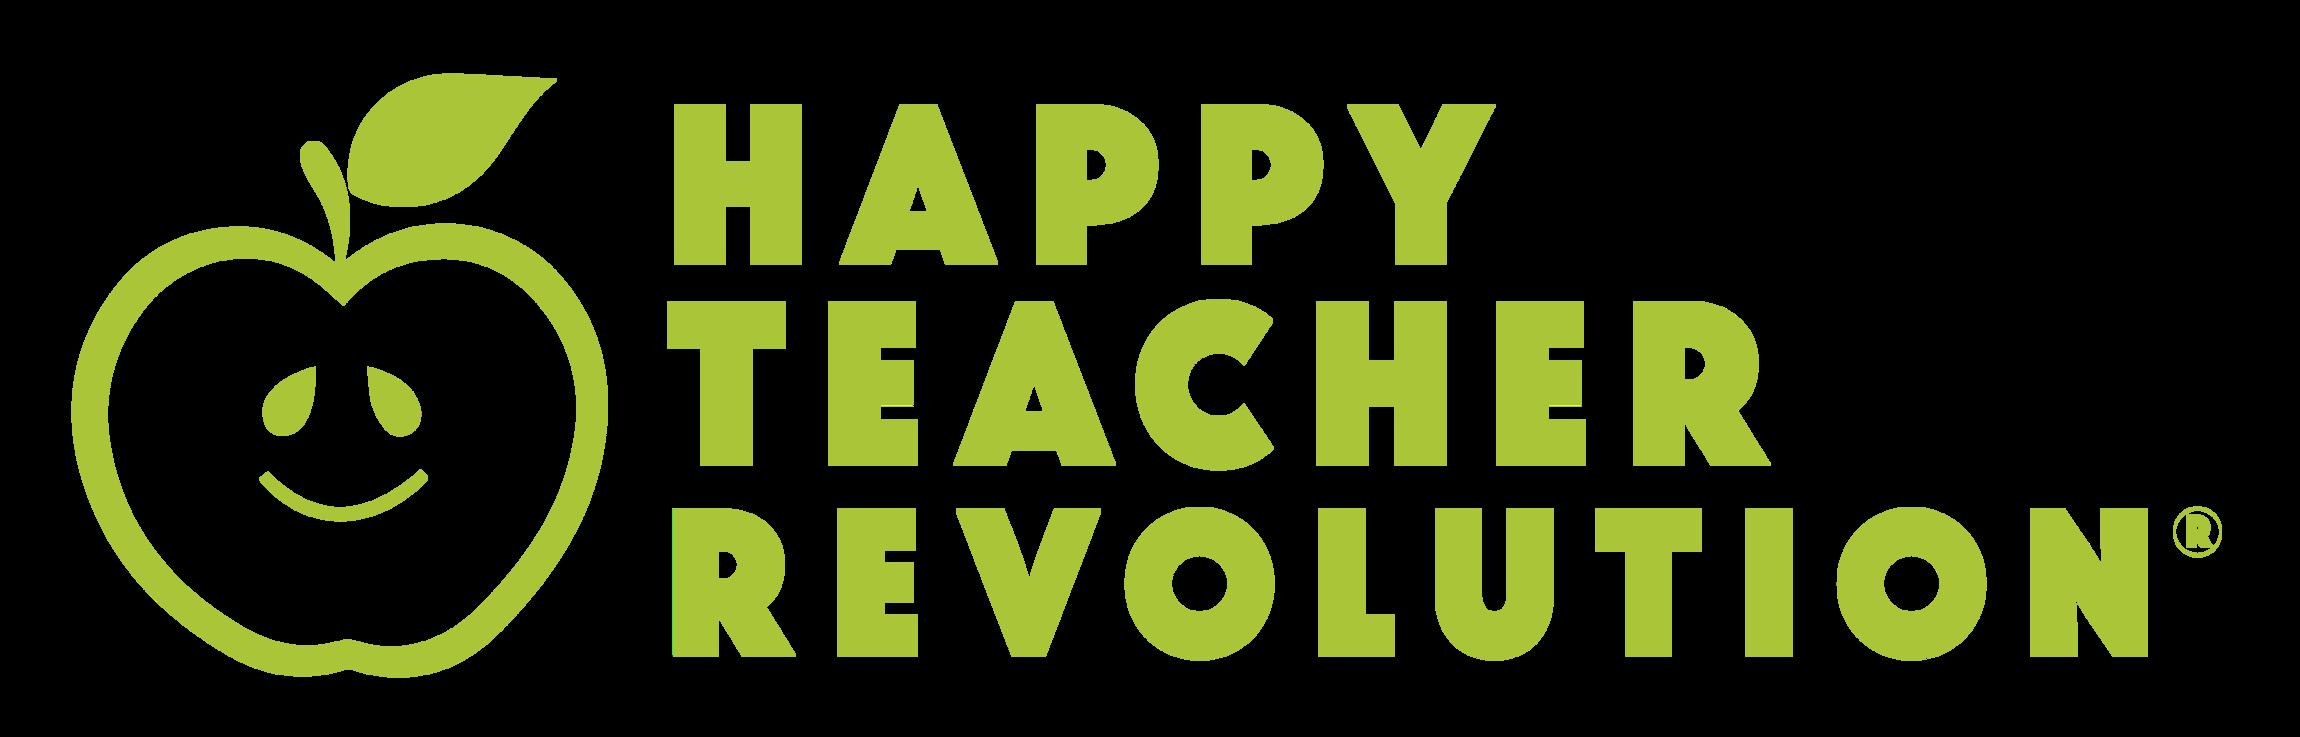 pQD7O1TMRb6ou5bMQdad_Happy_Teacher_Revolution-Logo-Green